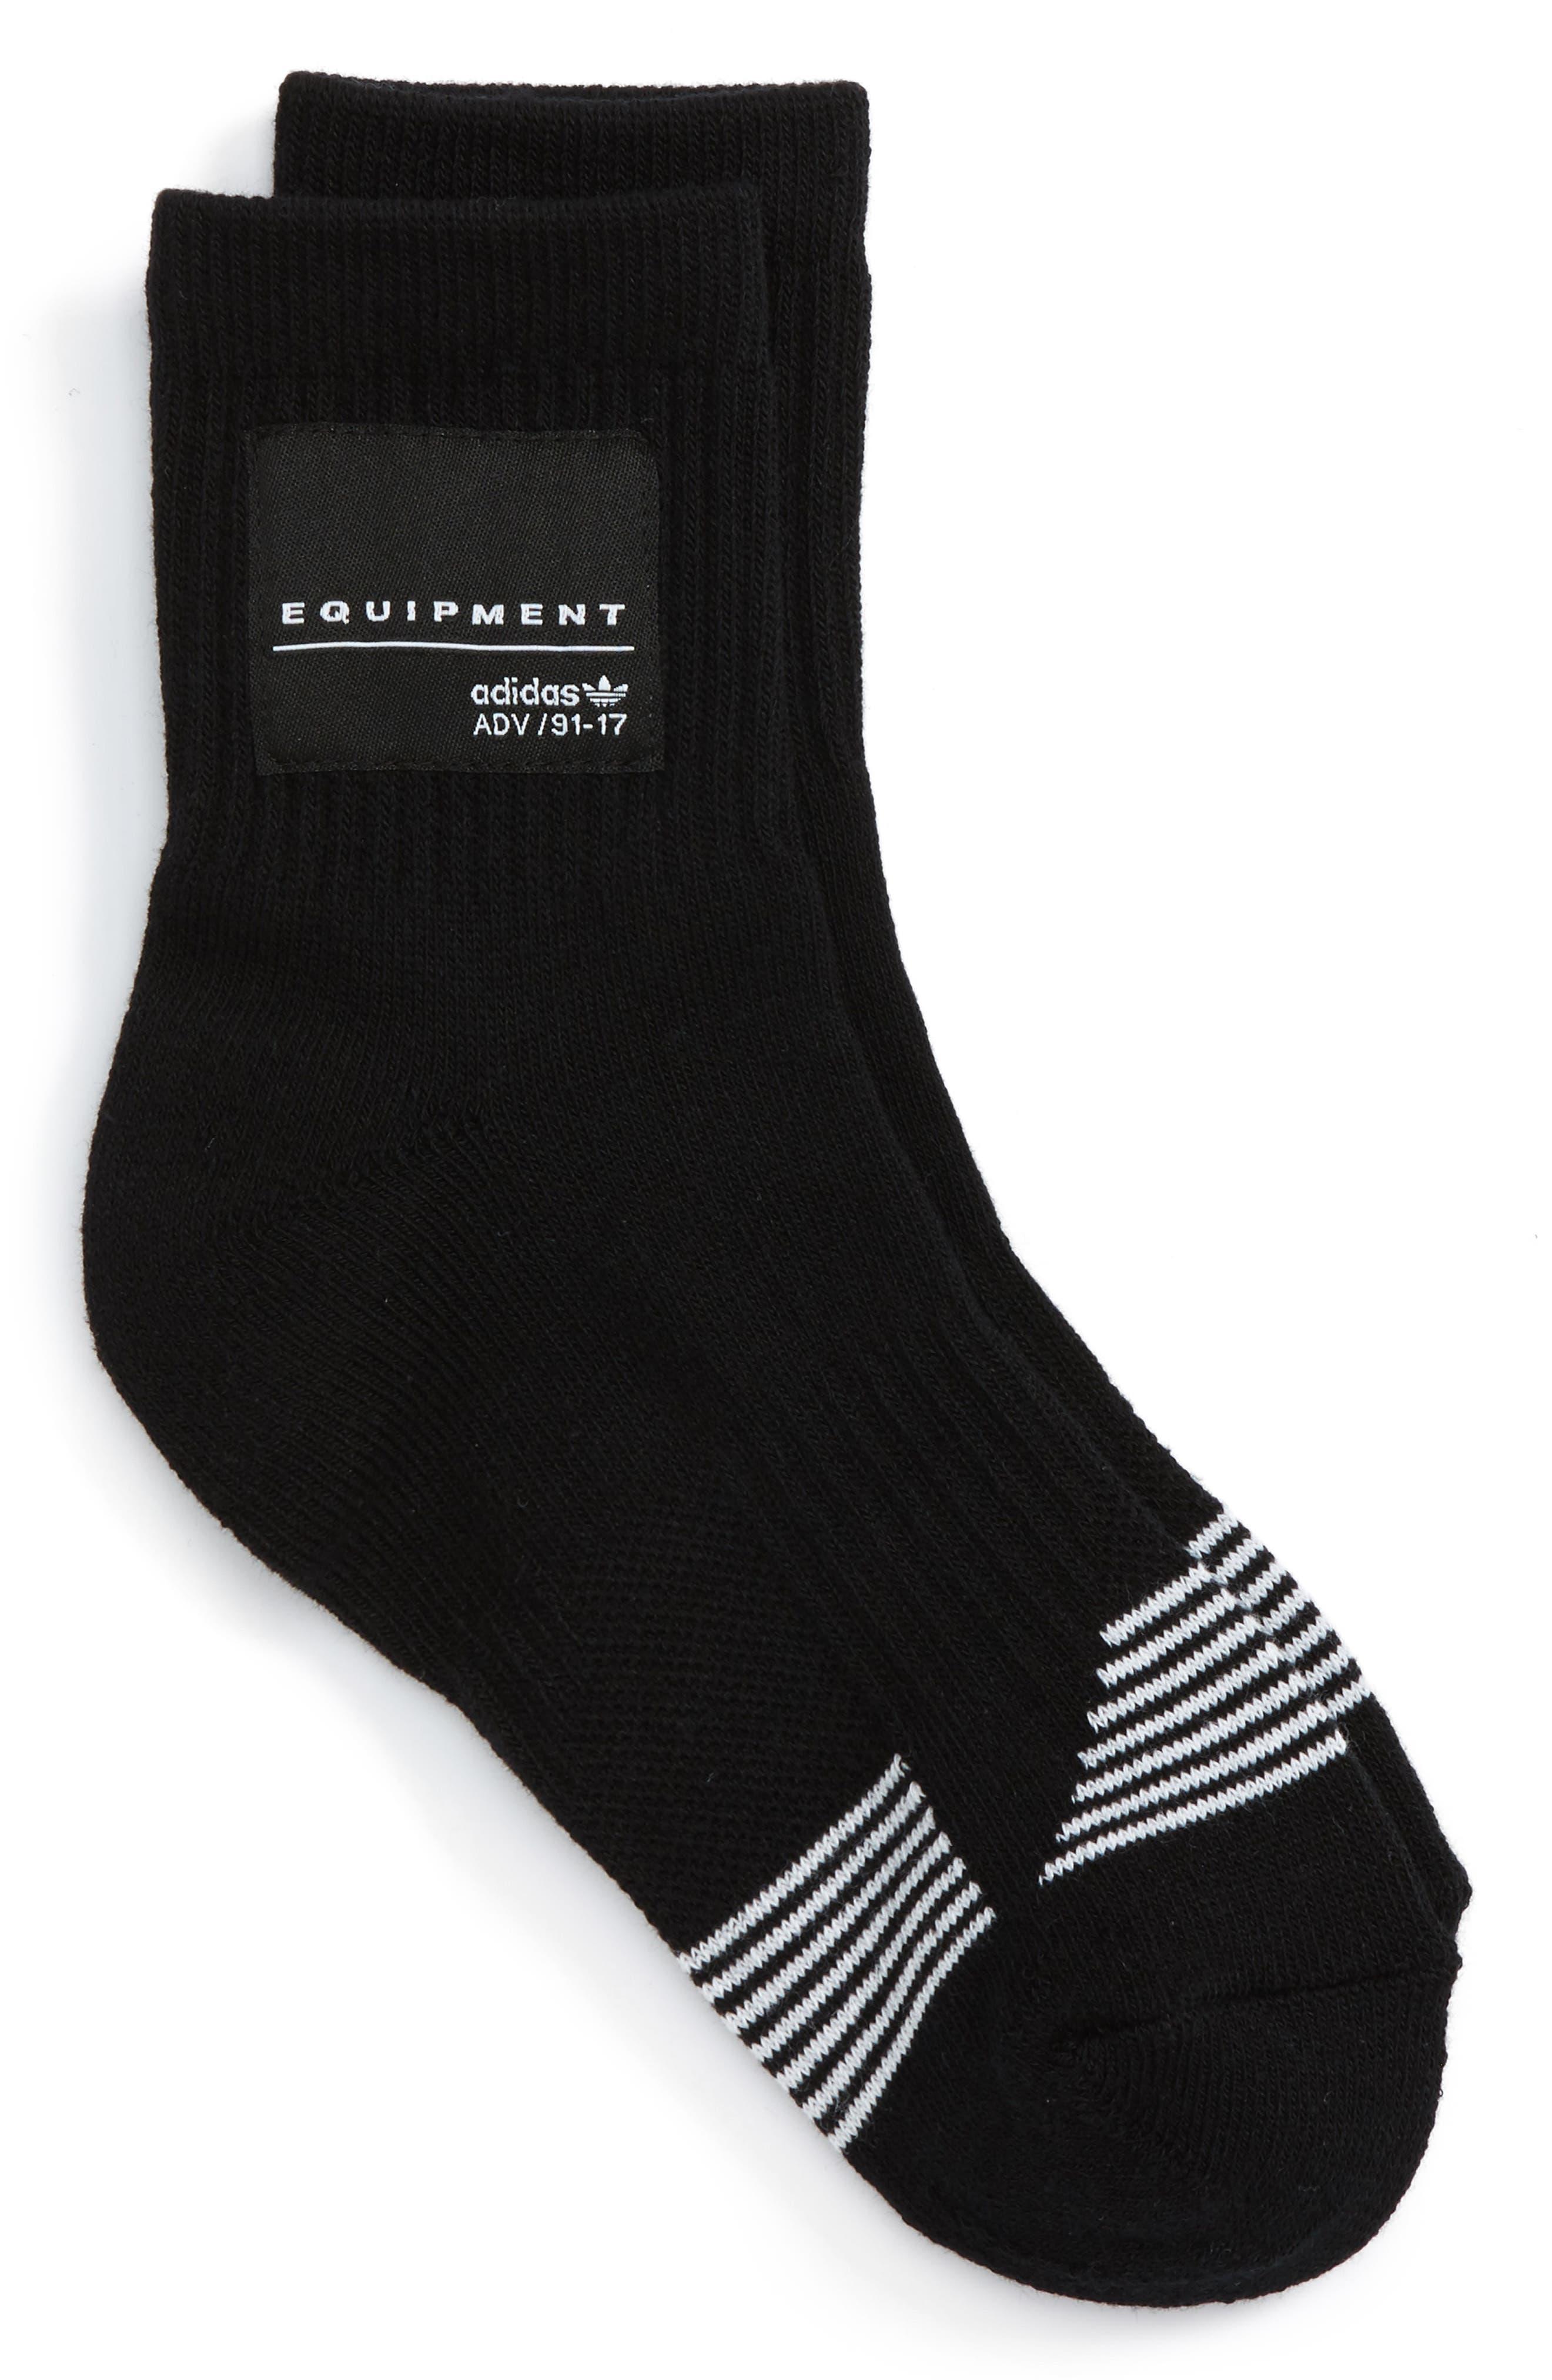 Equipment Crew Socks,                             Main thumbnail 1, color,                             Black/ White